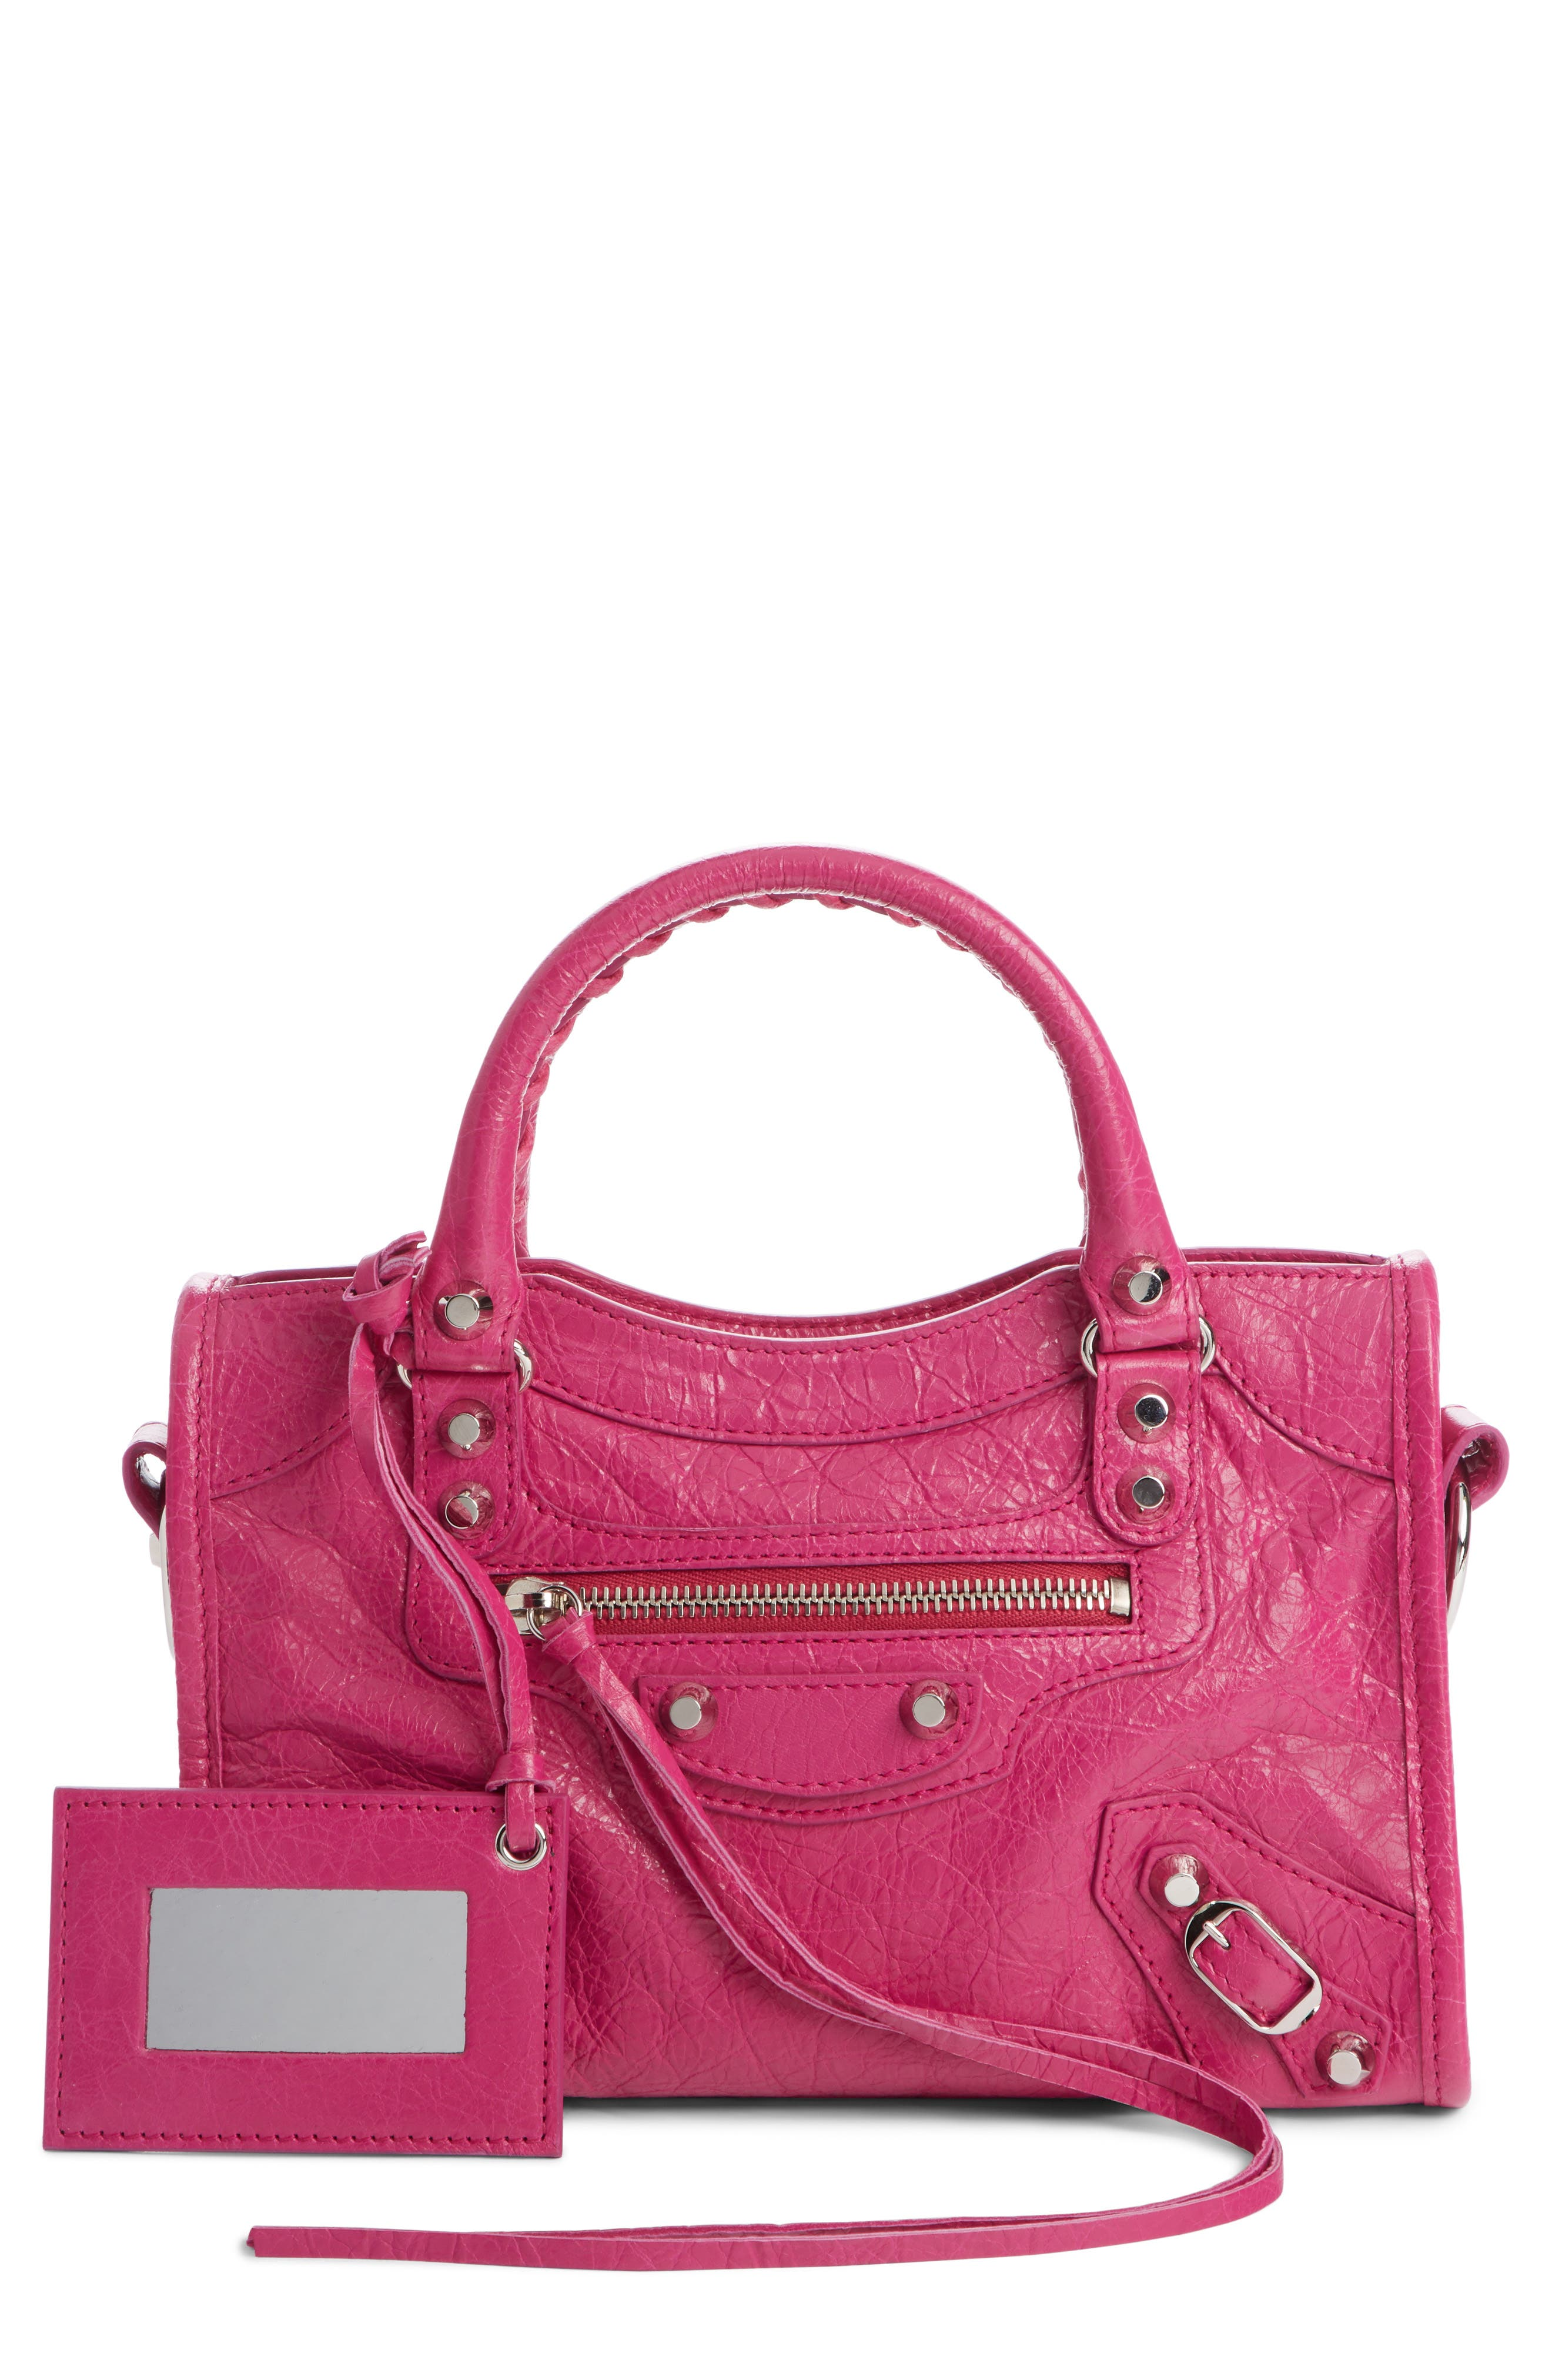 Balenciaga Handbags   Wallets for Women  95b9d2cb13590